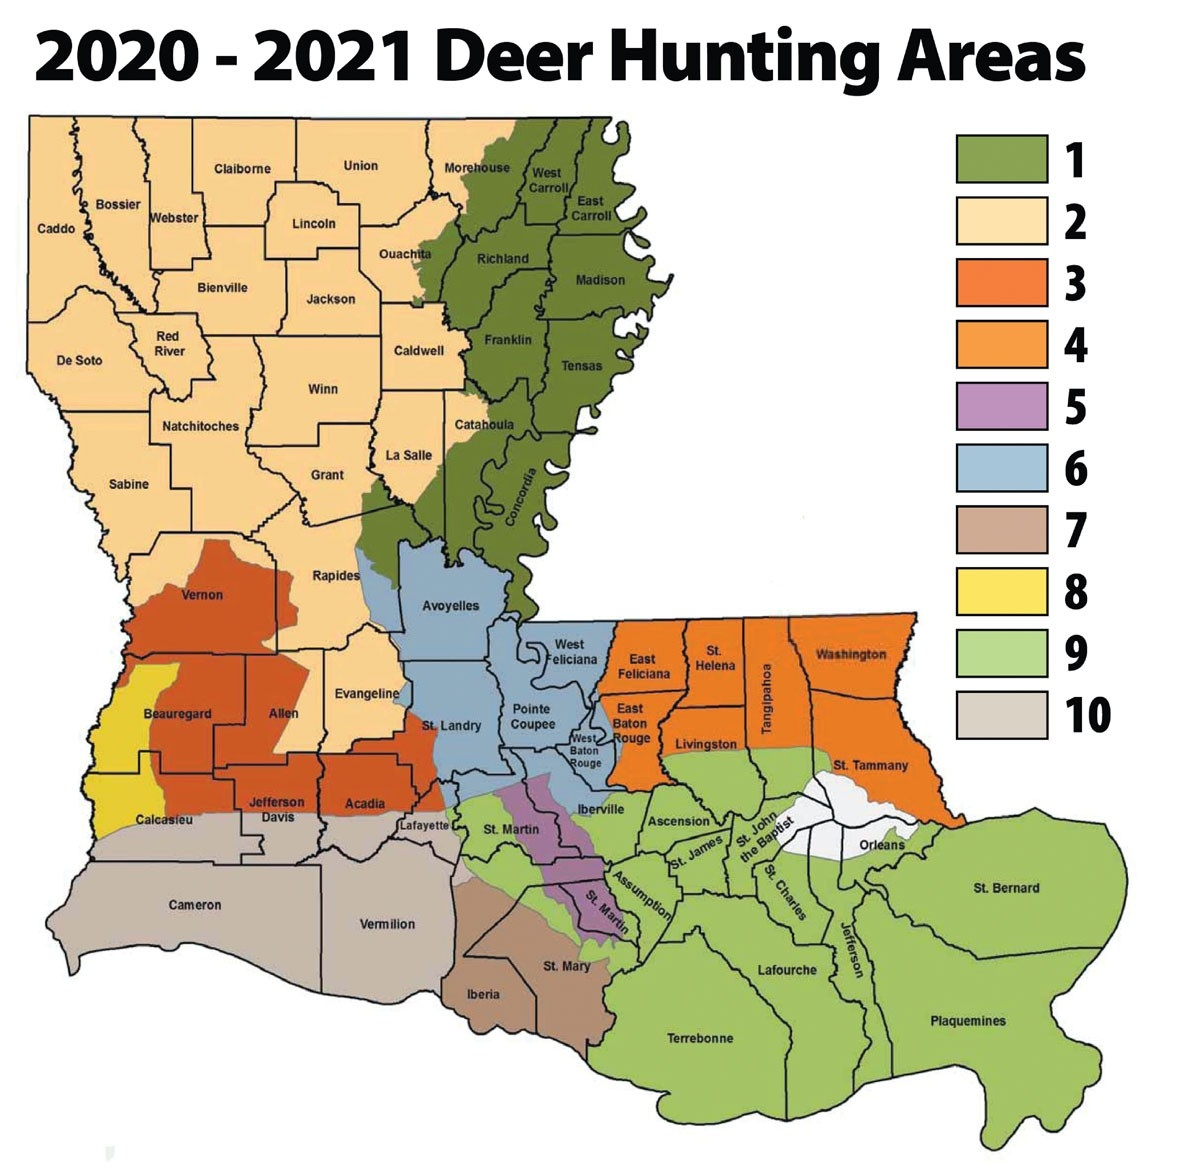 Louisiana'S 2020 Rut Report - Louisiana Sportsman  2021 Whitetail Rut Prediction